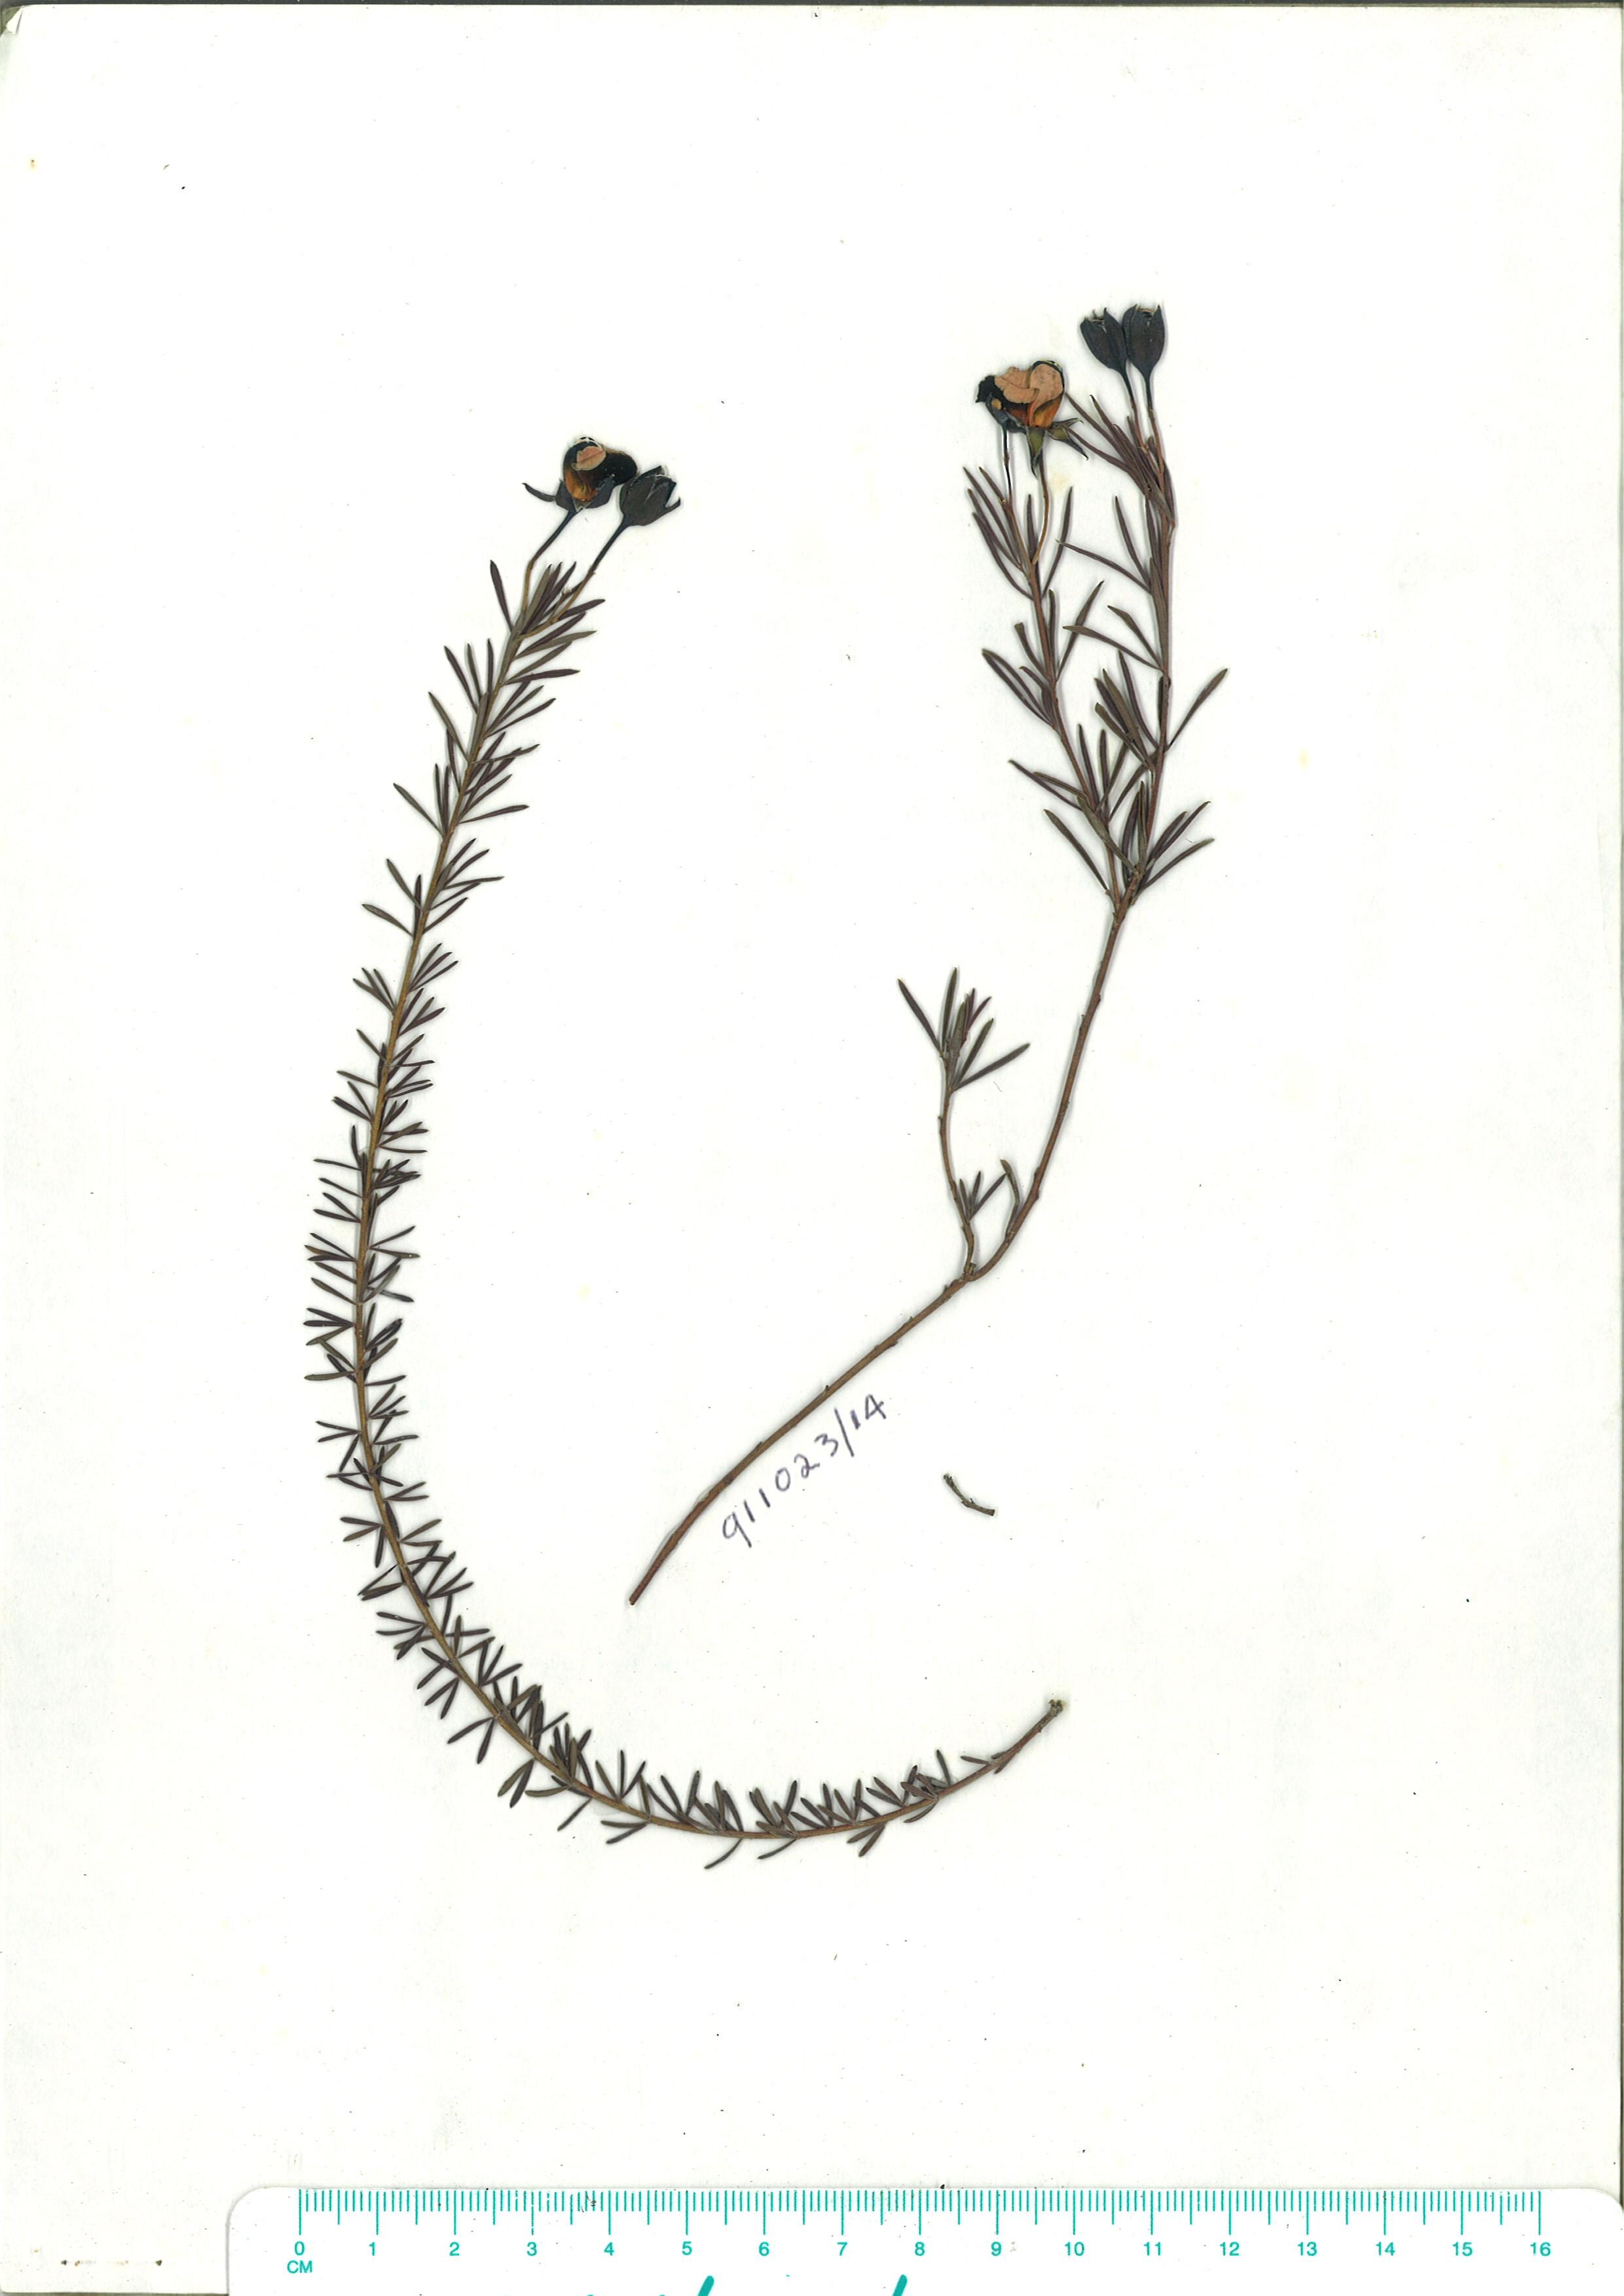 Scanned herbarium image of Gompholobium huegelii